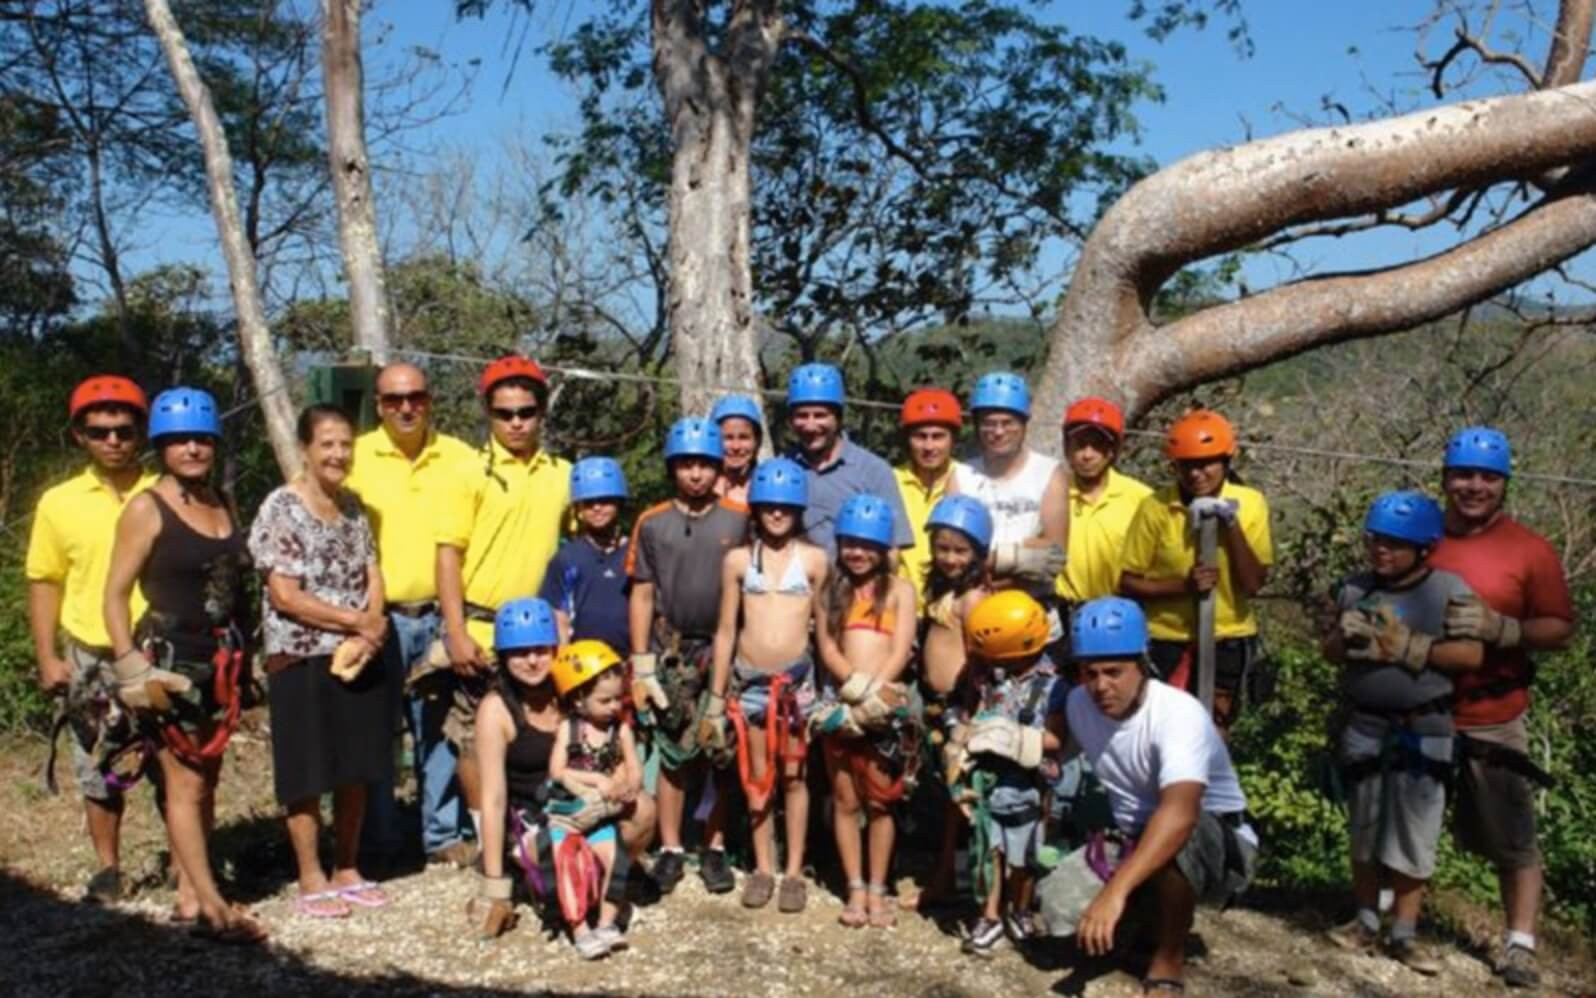 Tamarindo Guanacaste Costa Rica zipline canopy tour group